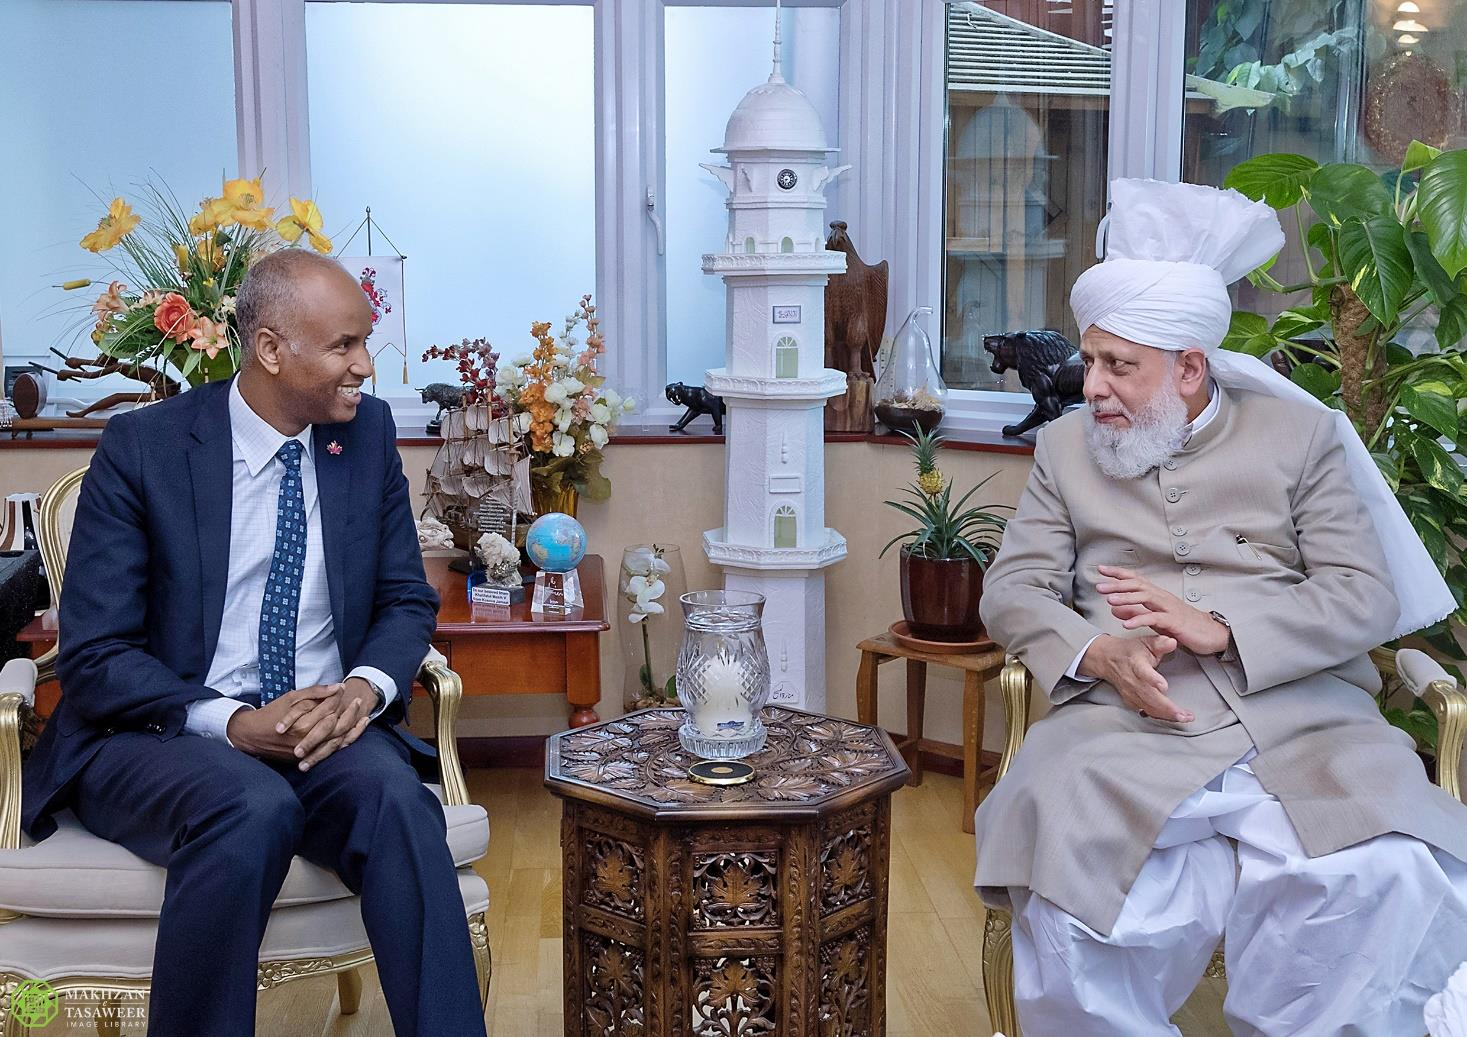 Canadian Minister Ahmed Hussen visits Head of Ahmadiyya Muslim Community in London